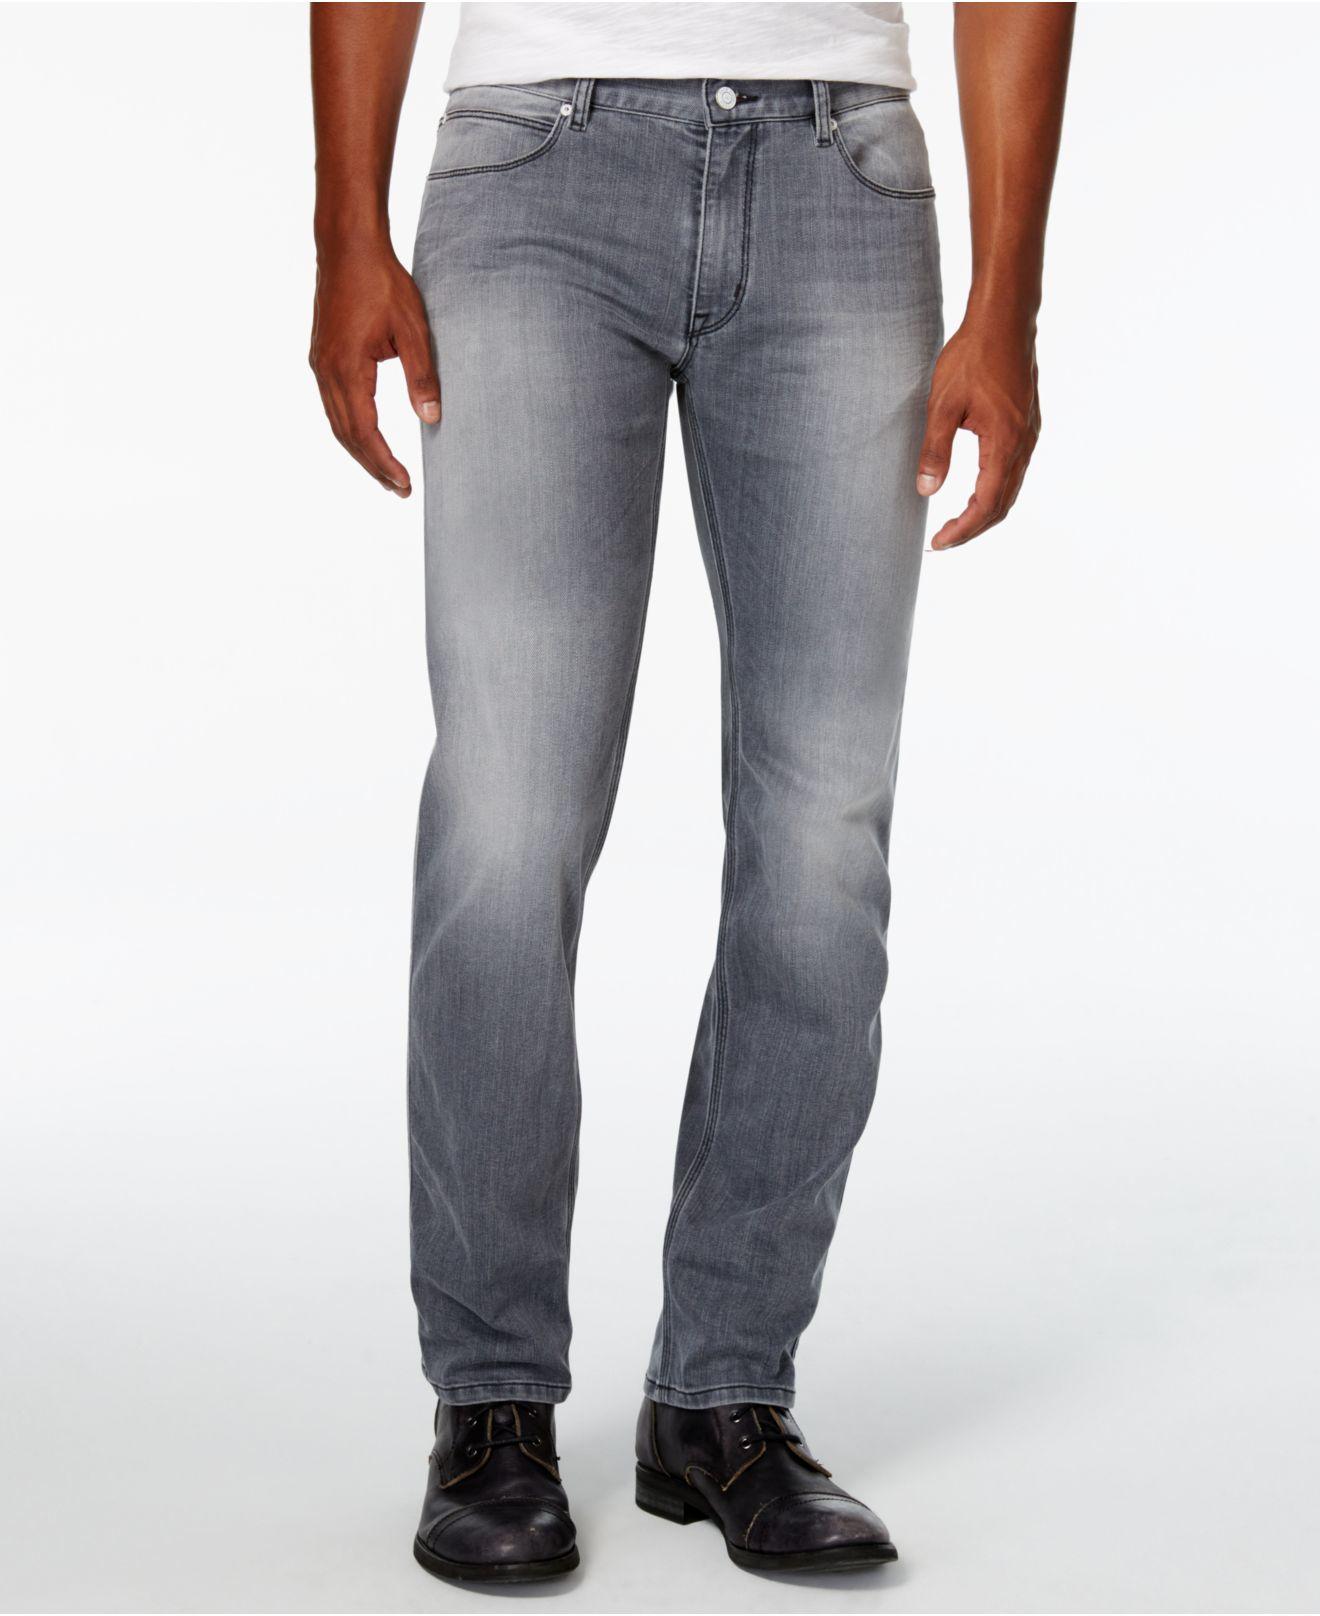 lyst boss men 39 s 708 slim fit gray wash jeans in gray for men. Black Bedroom Furniture Sets. Home Design Ideas